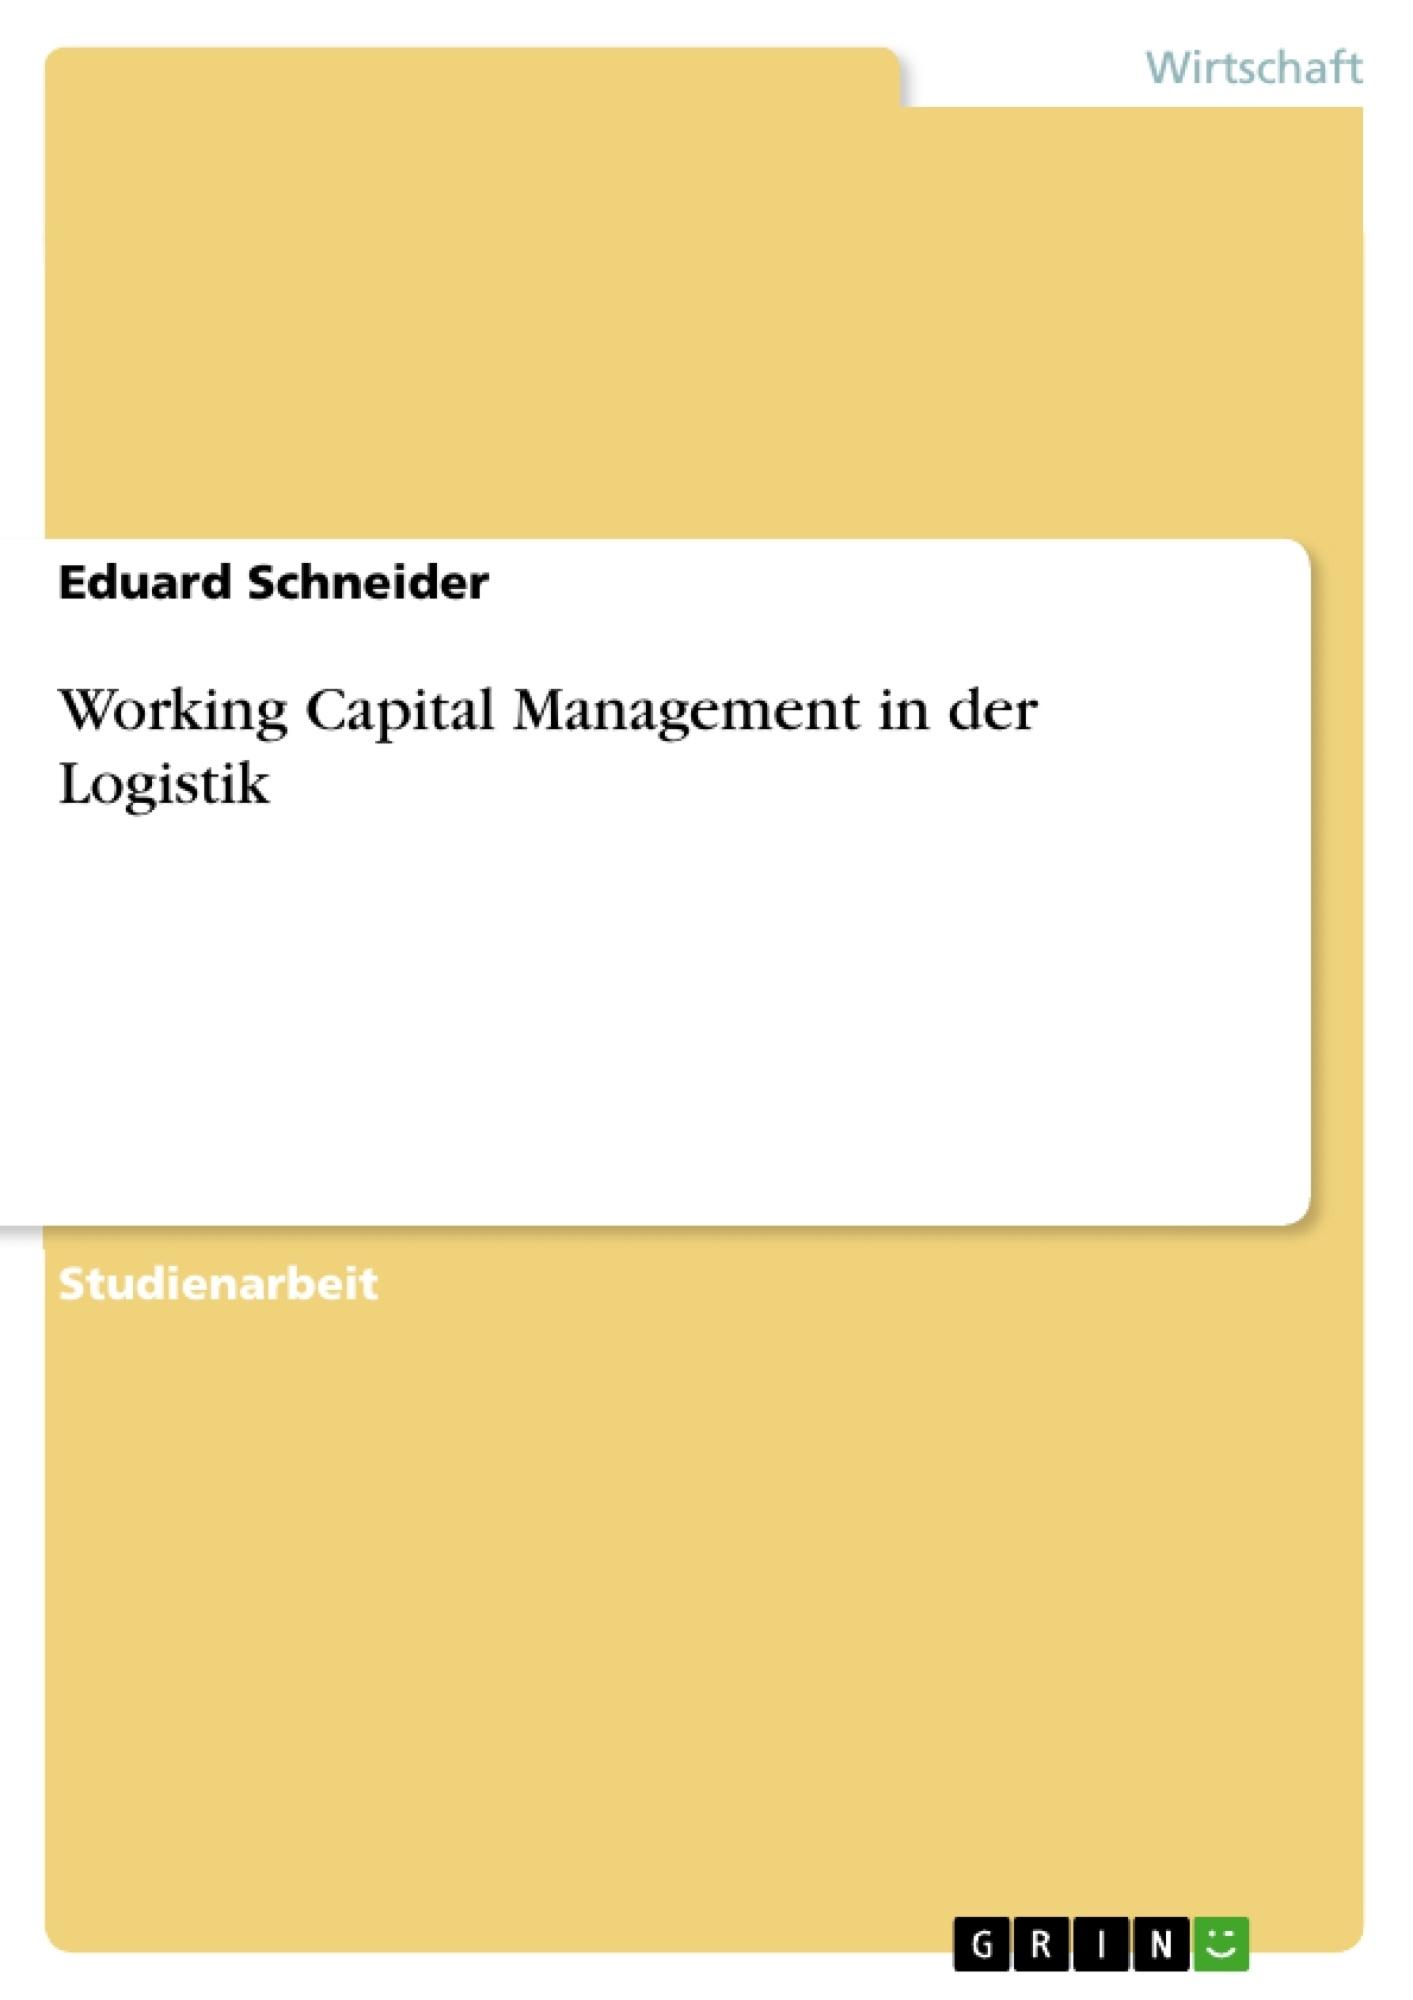 Titel: Working Capital Management in der Logistik